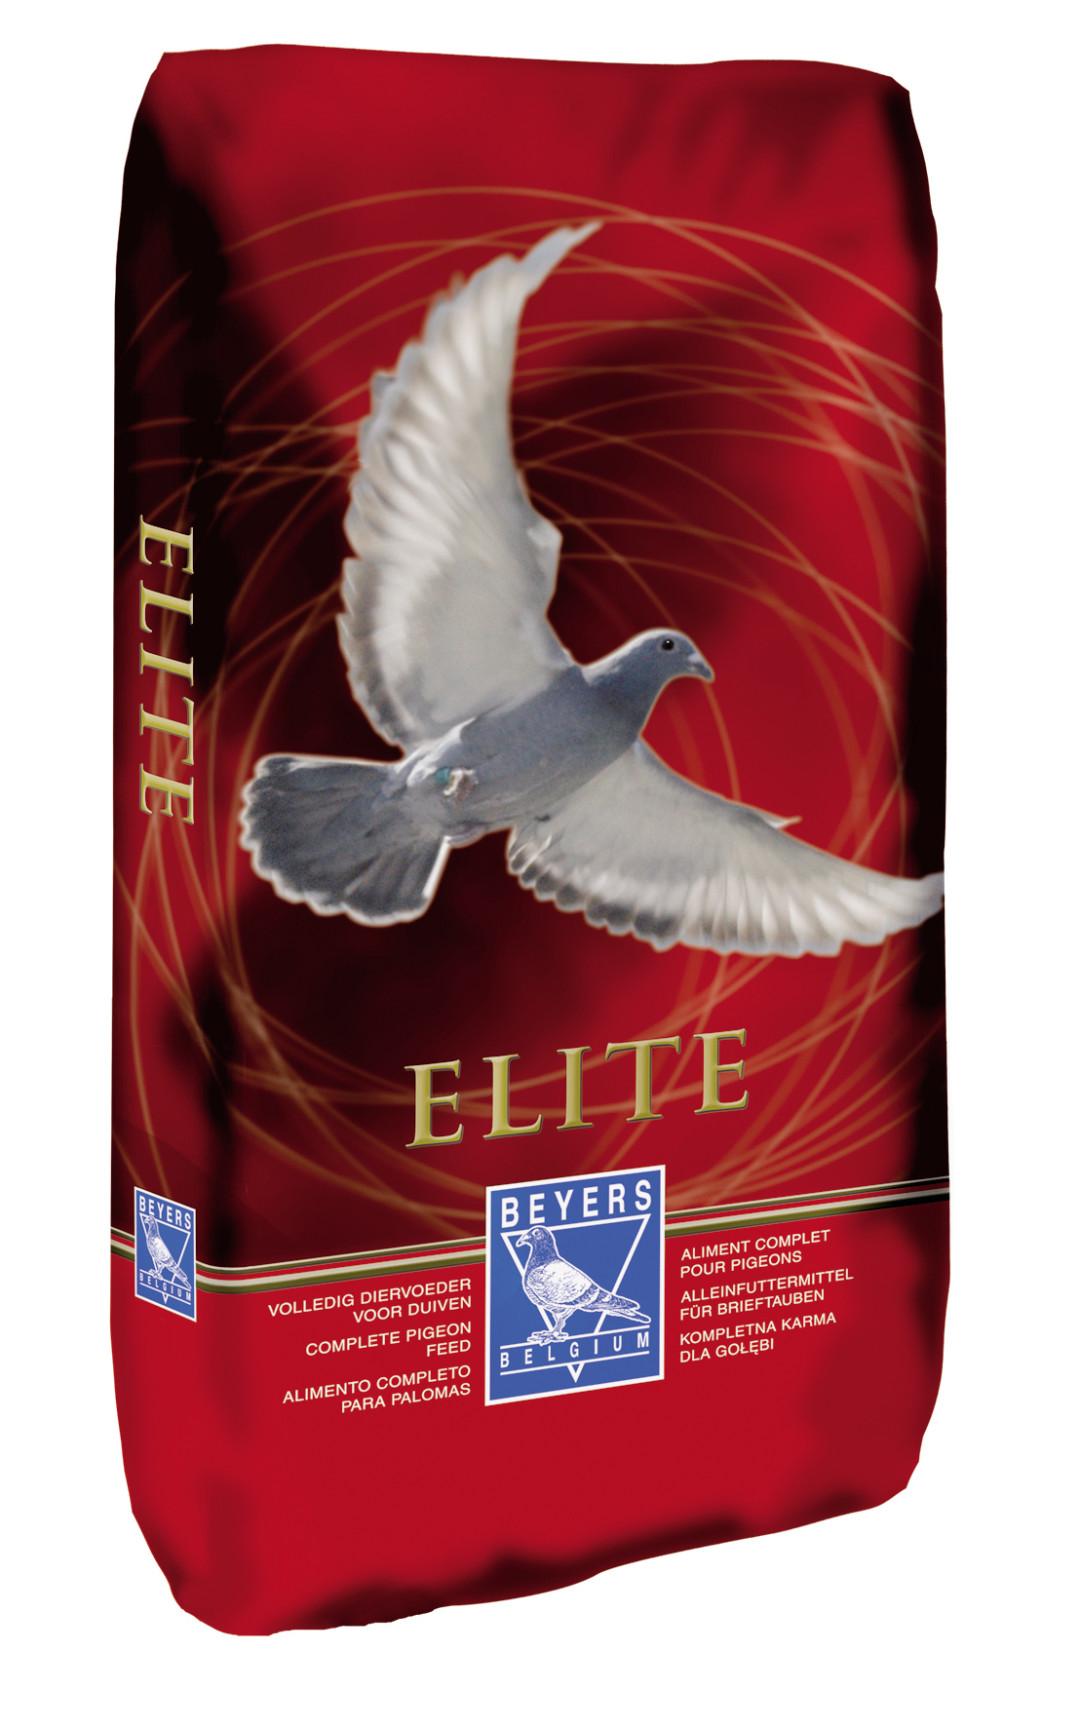 Beyers Elite Enzymix MS Extra Opbouw <br>7/43 - 20 kg